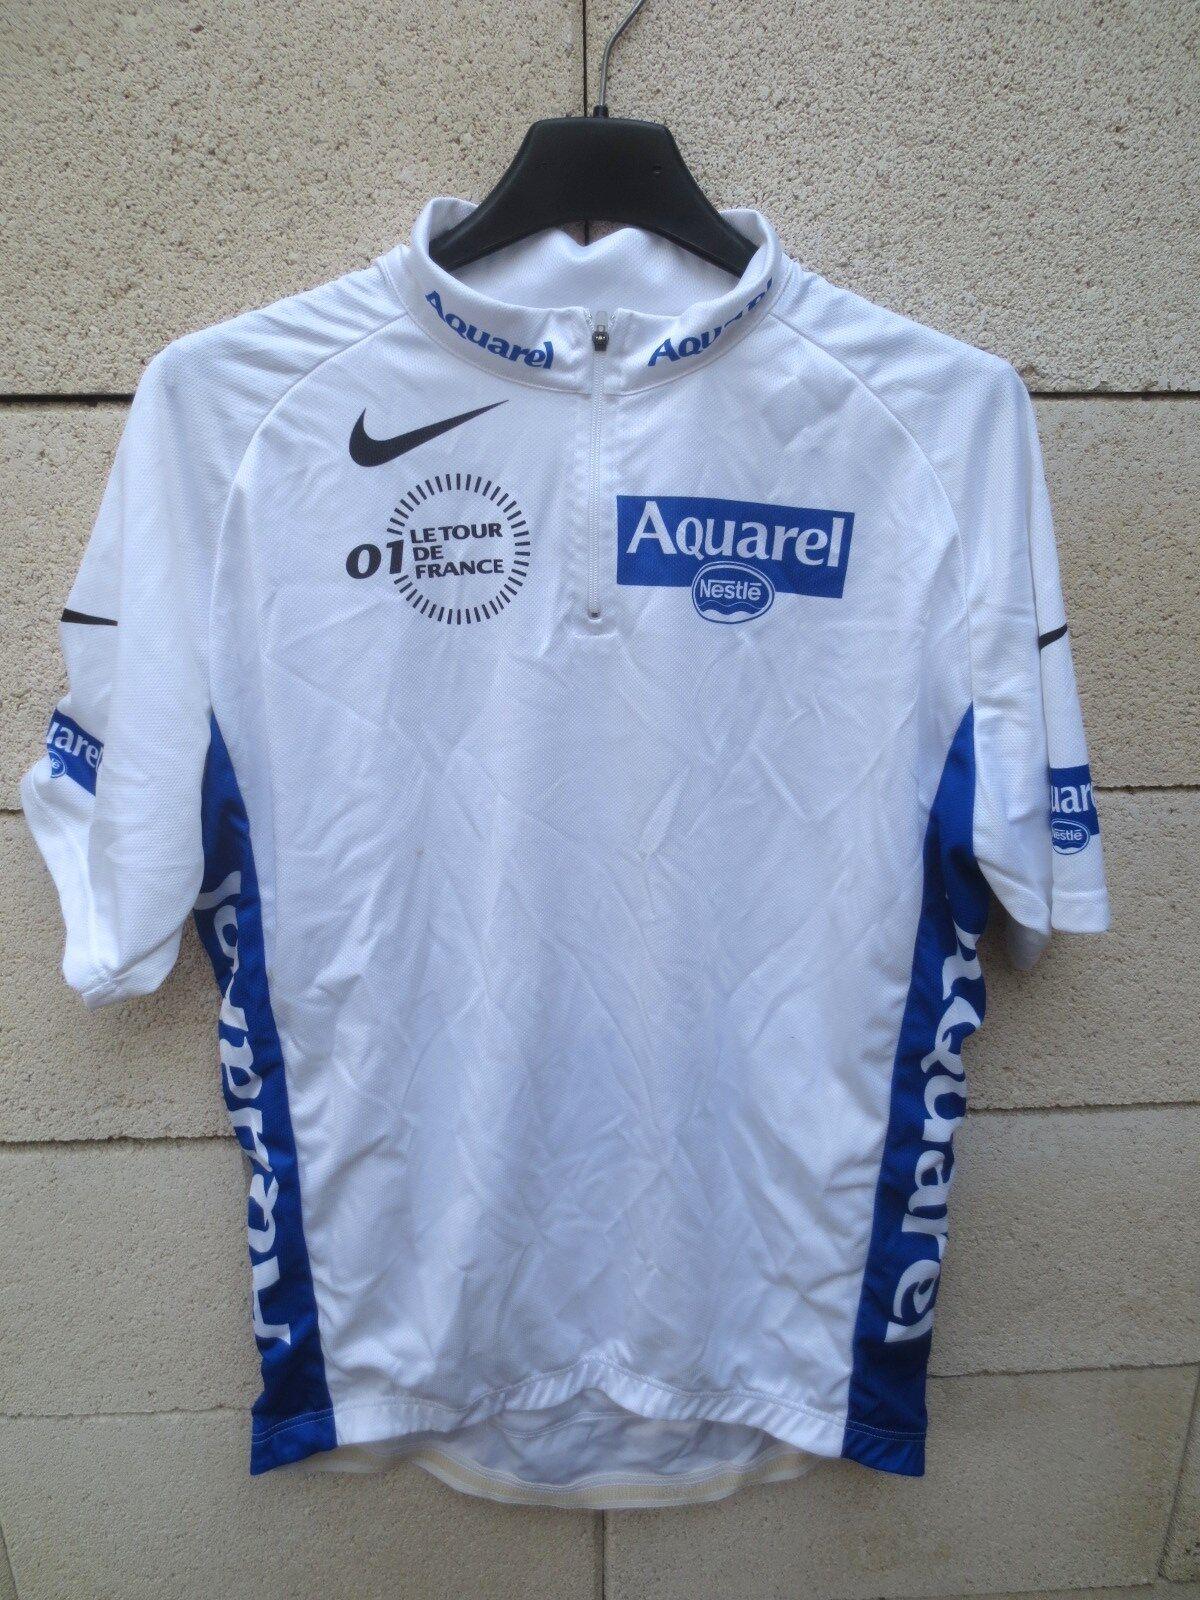 Maillot cycliste white Tour de France 2001 NIKE shirt jersey camiseta SEVILLA L